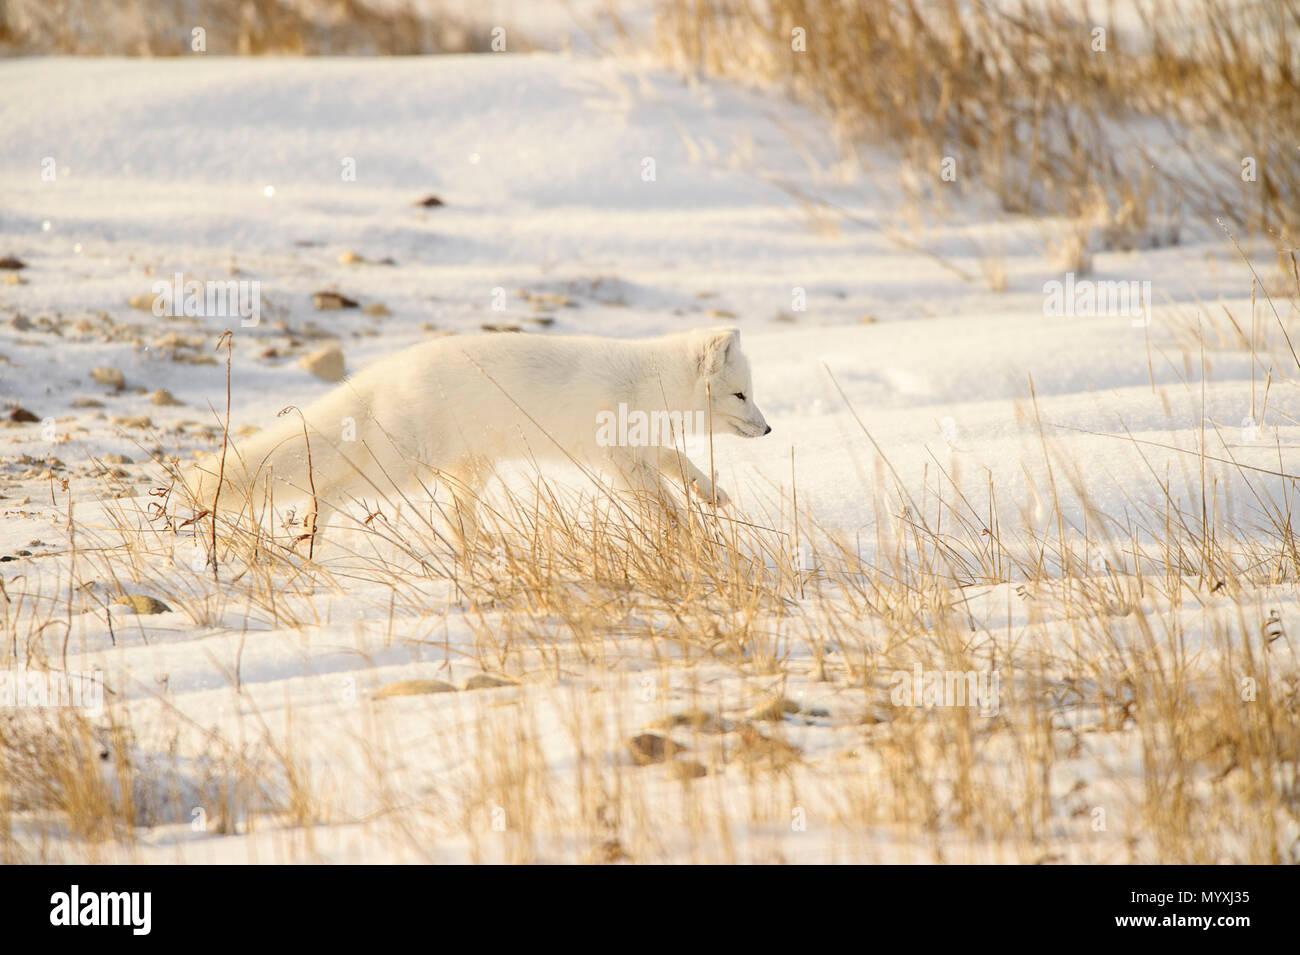 Arctic fox (Vulpes lagopus) Hunting in shoreline grasses, Churchill Wildlife Management area, Churchill, Manitoba, Canada Stock Photo